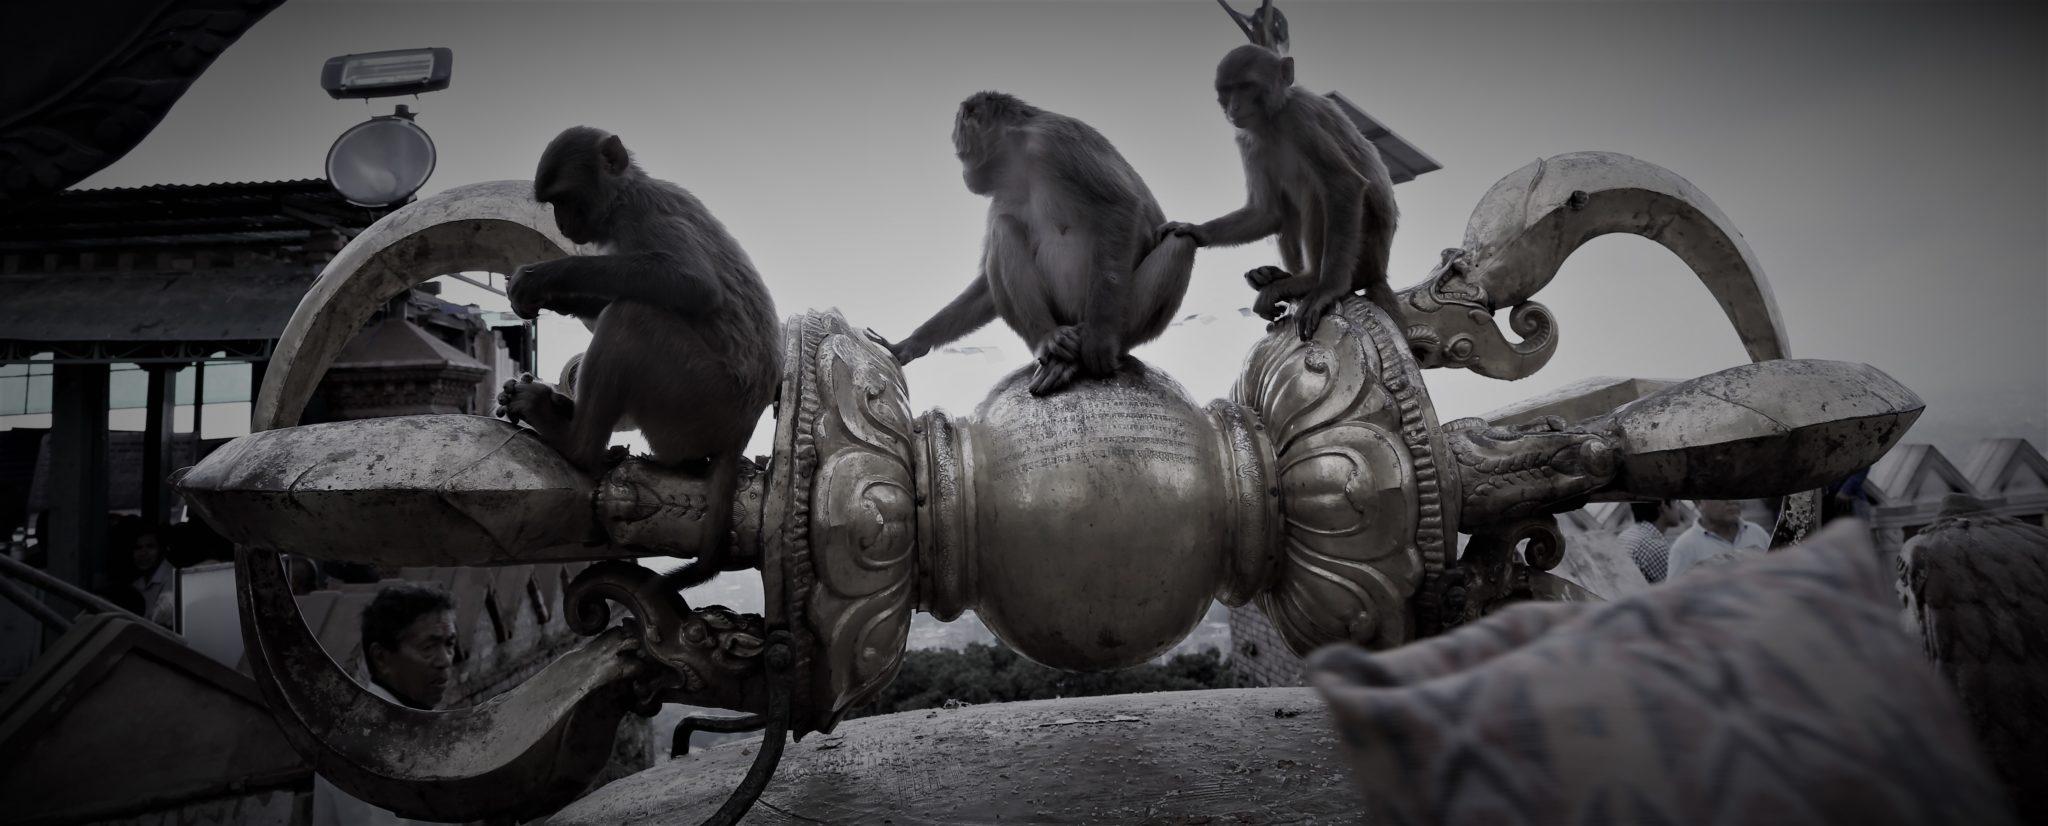 dorjé vajra Swayambhunath 3 singes sagesse